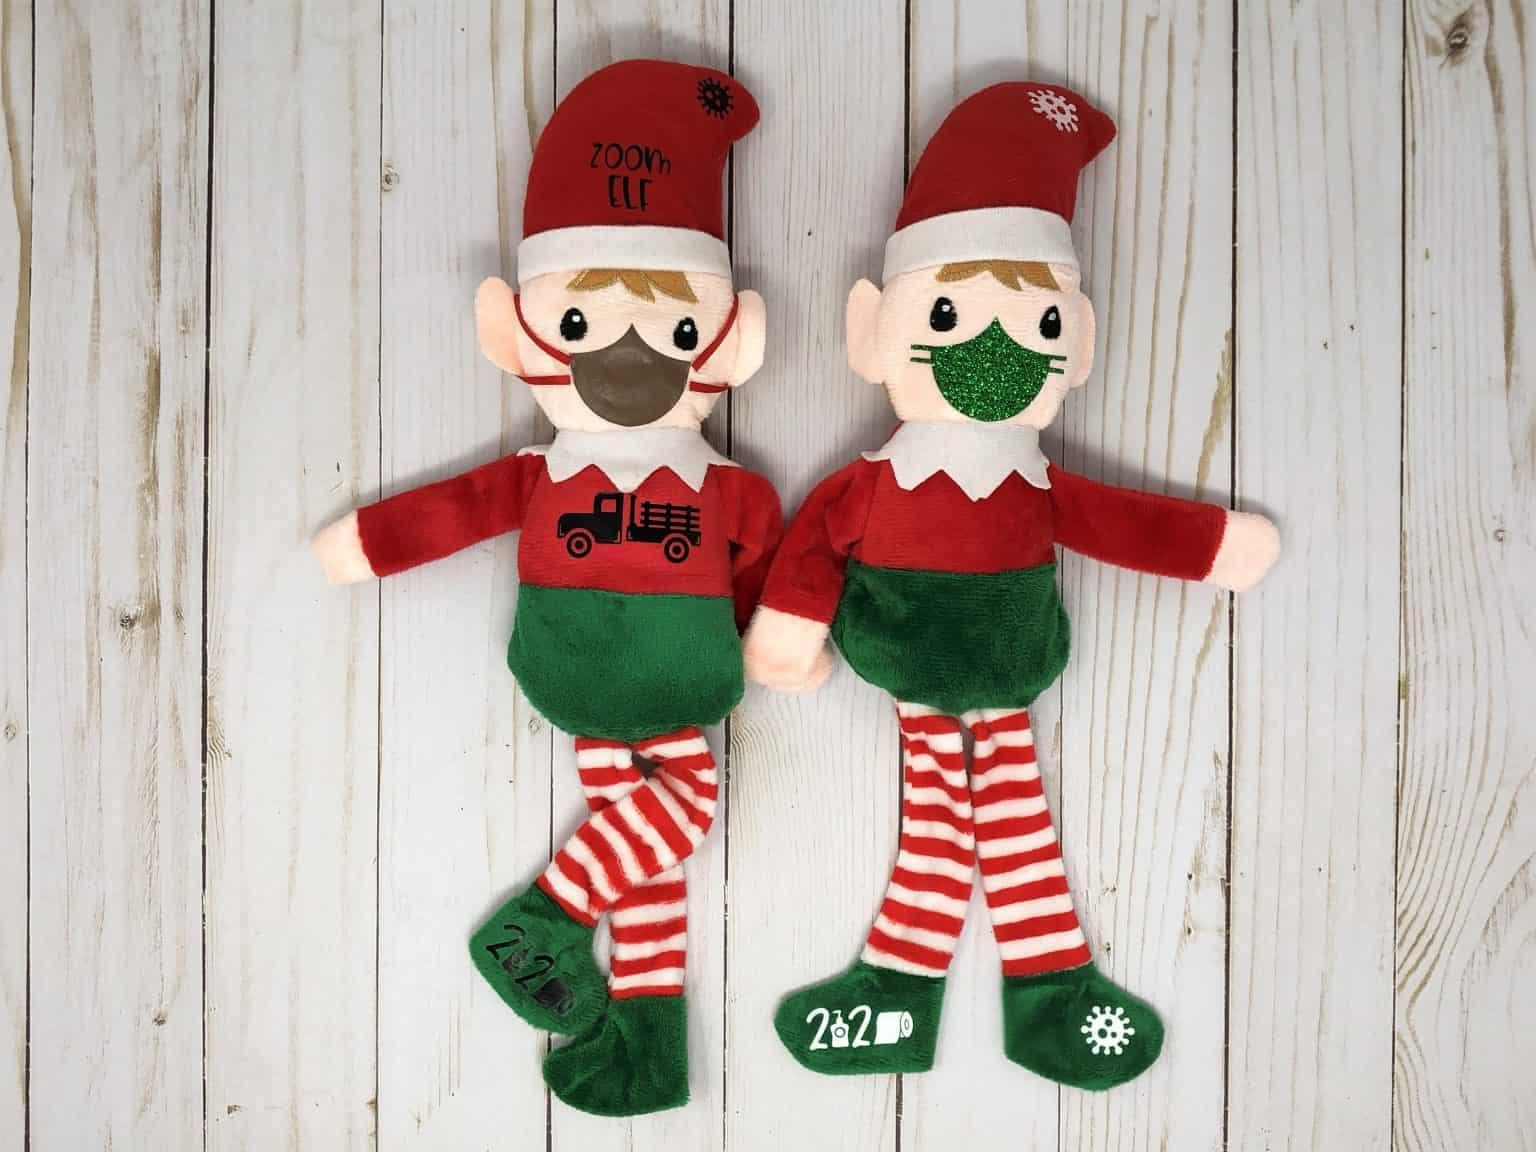 2 dollar tree elves with their masks on